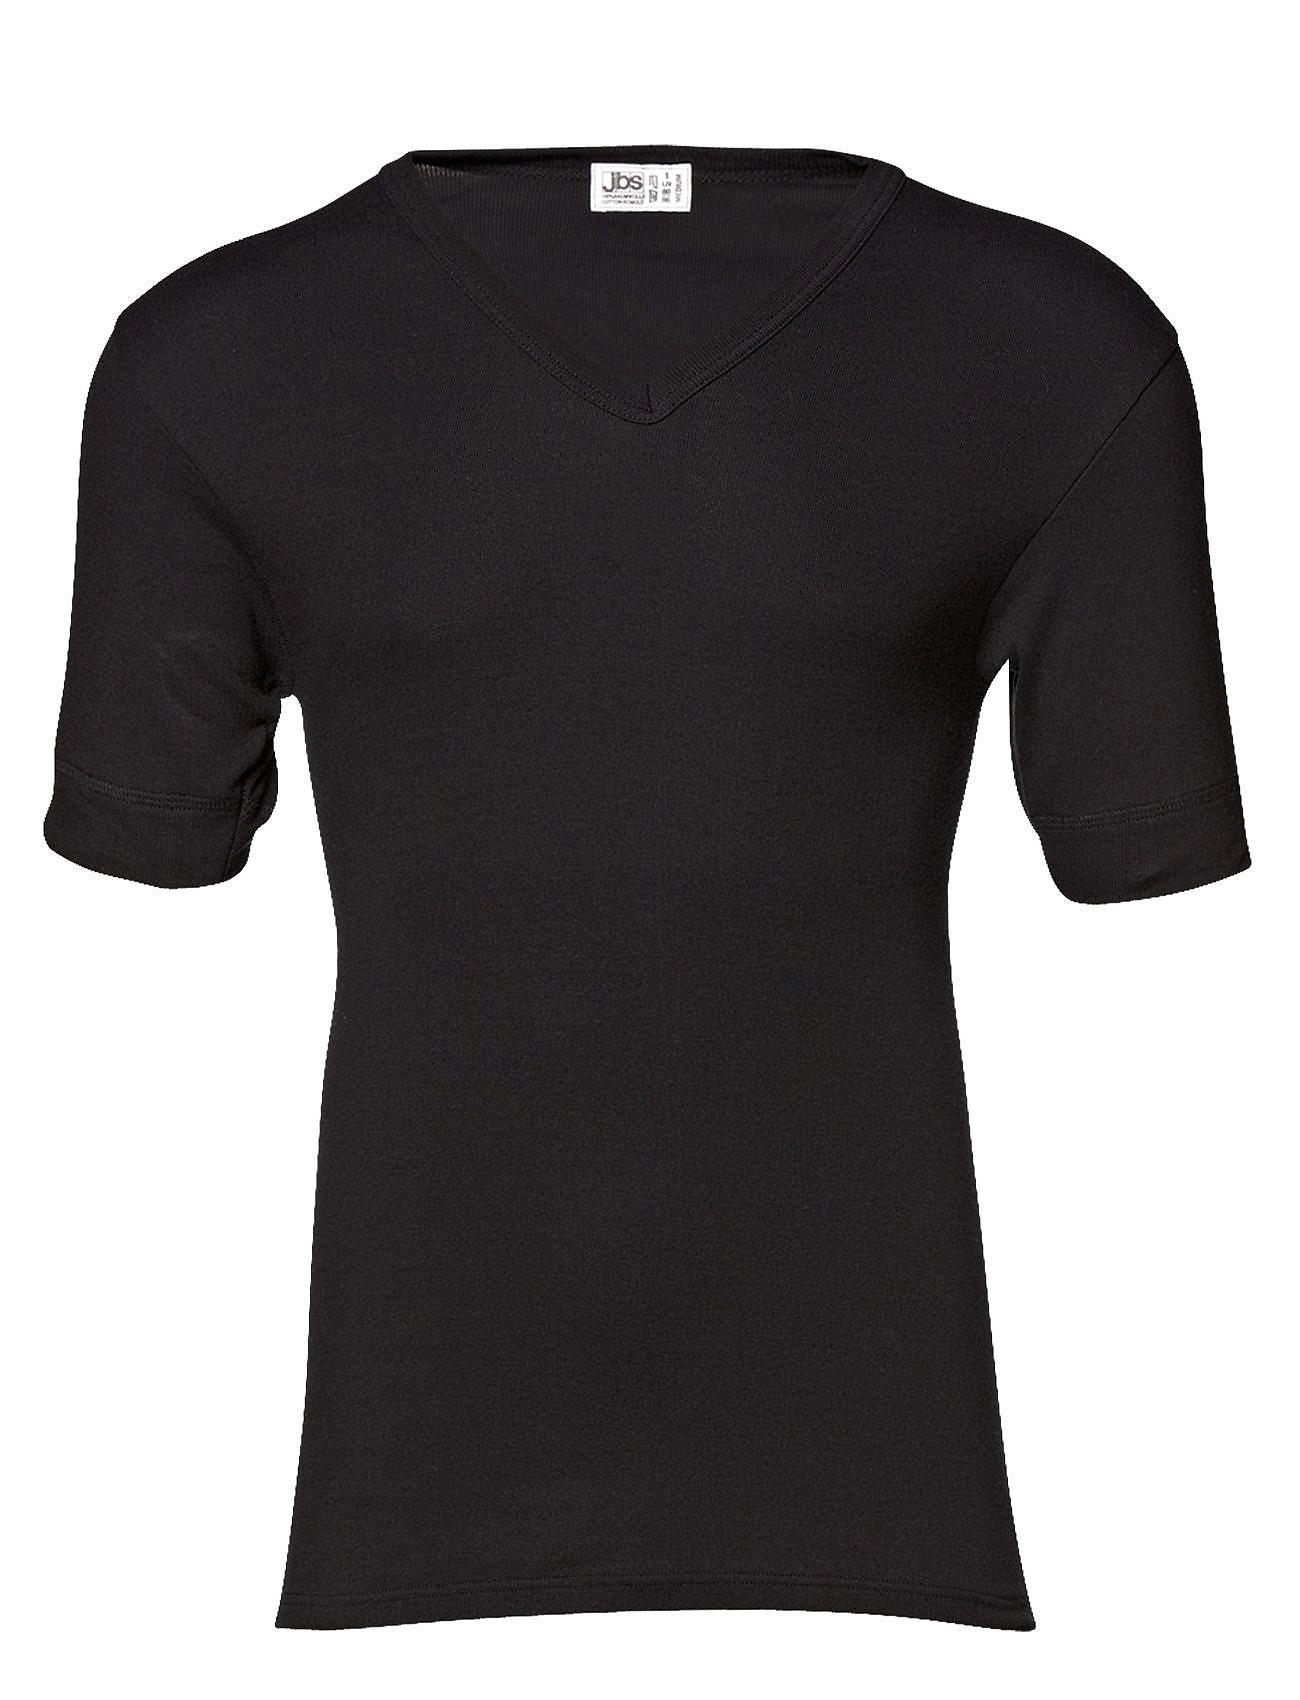 JBS Original v-neck tee - BLACK